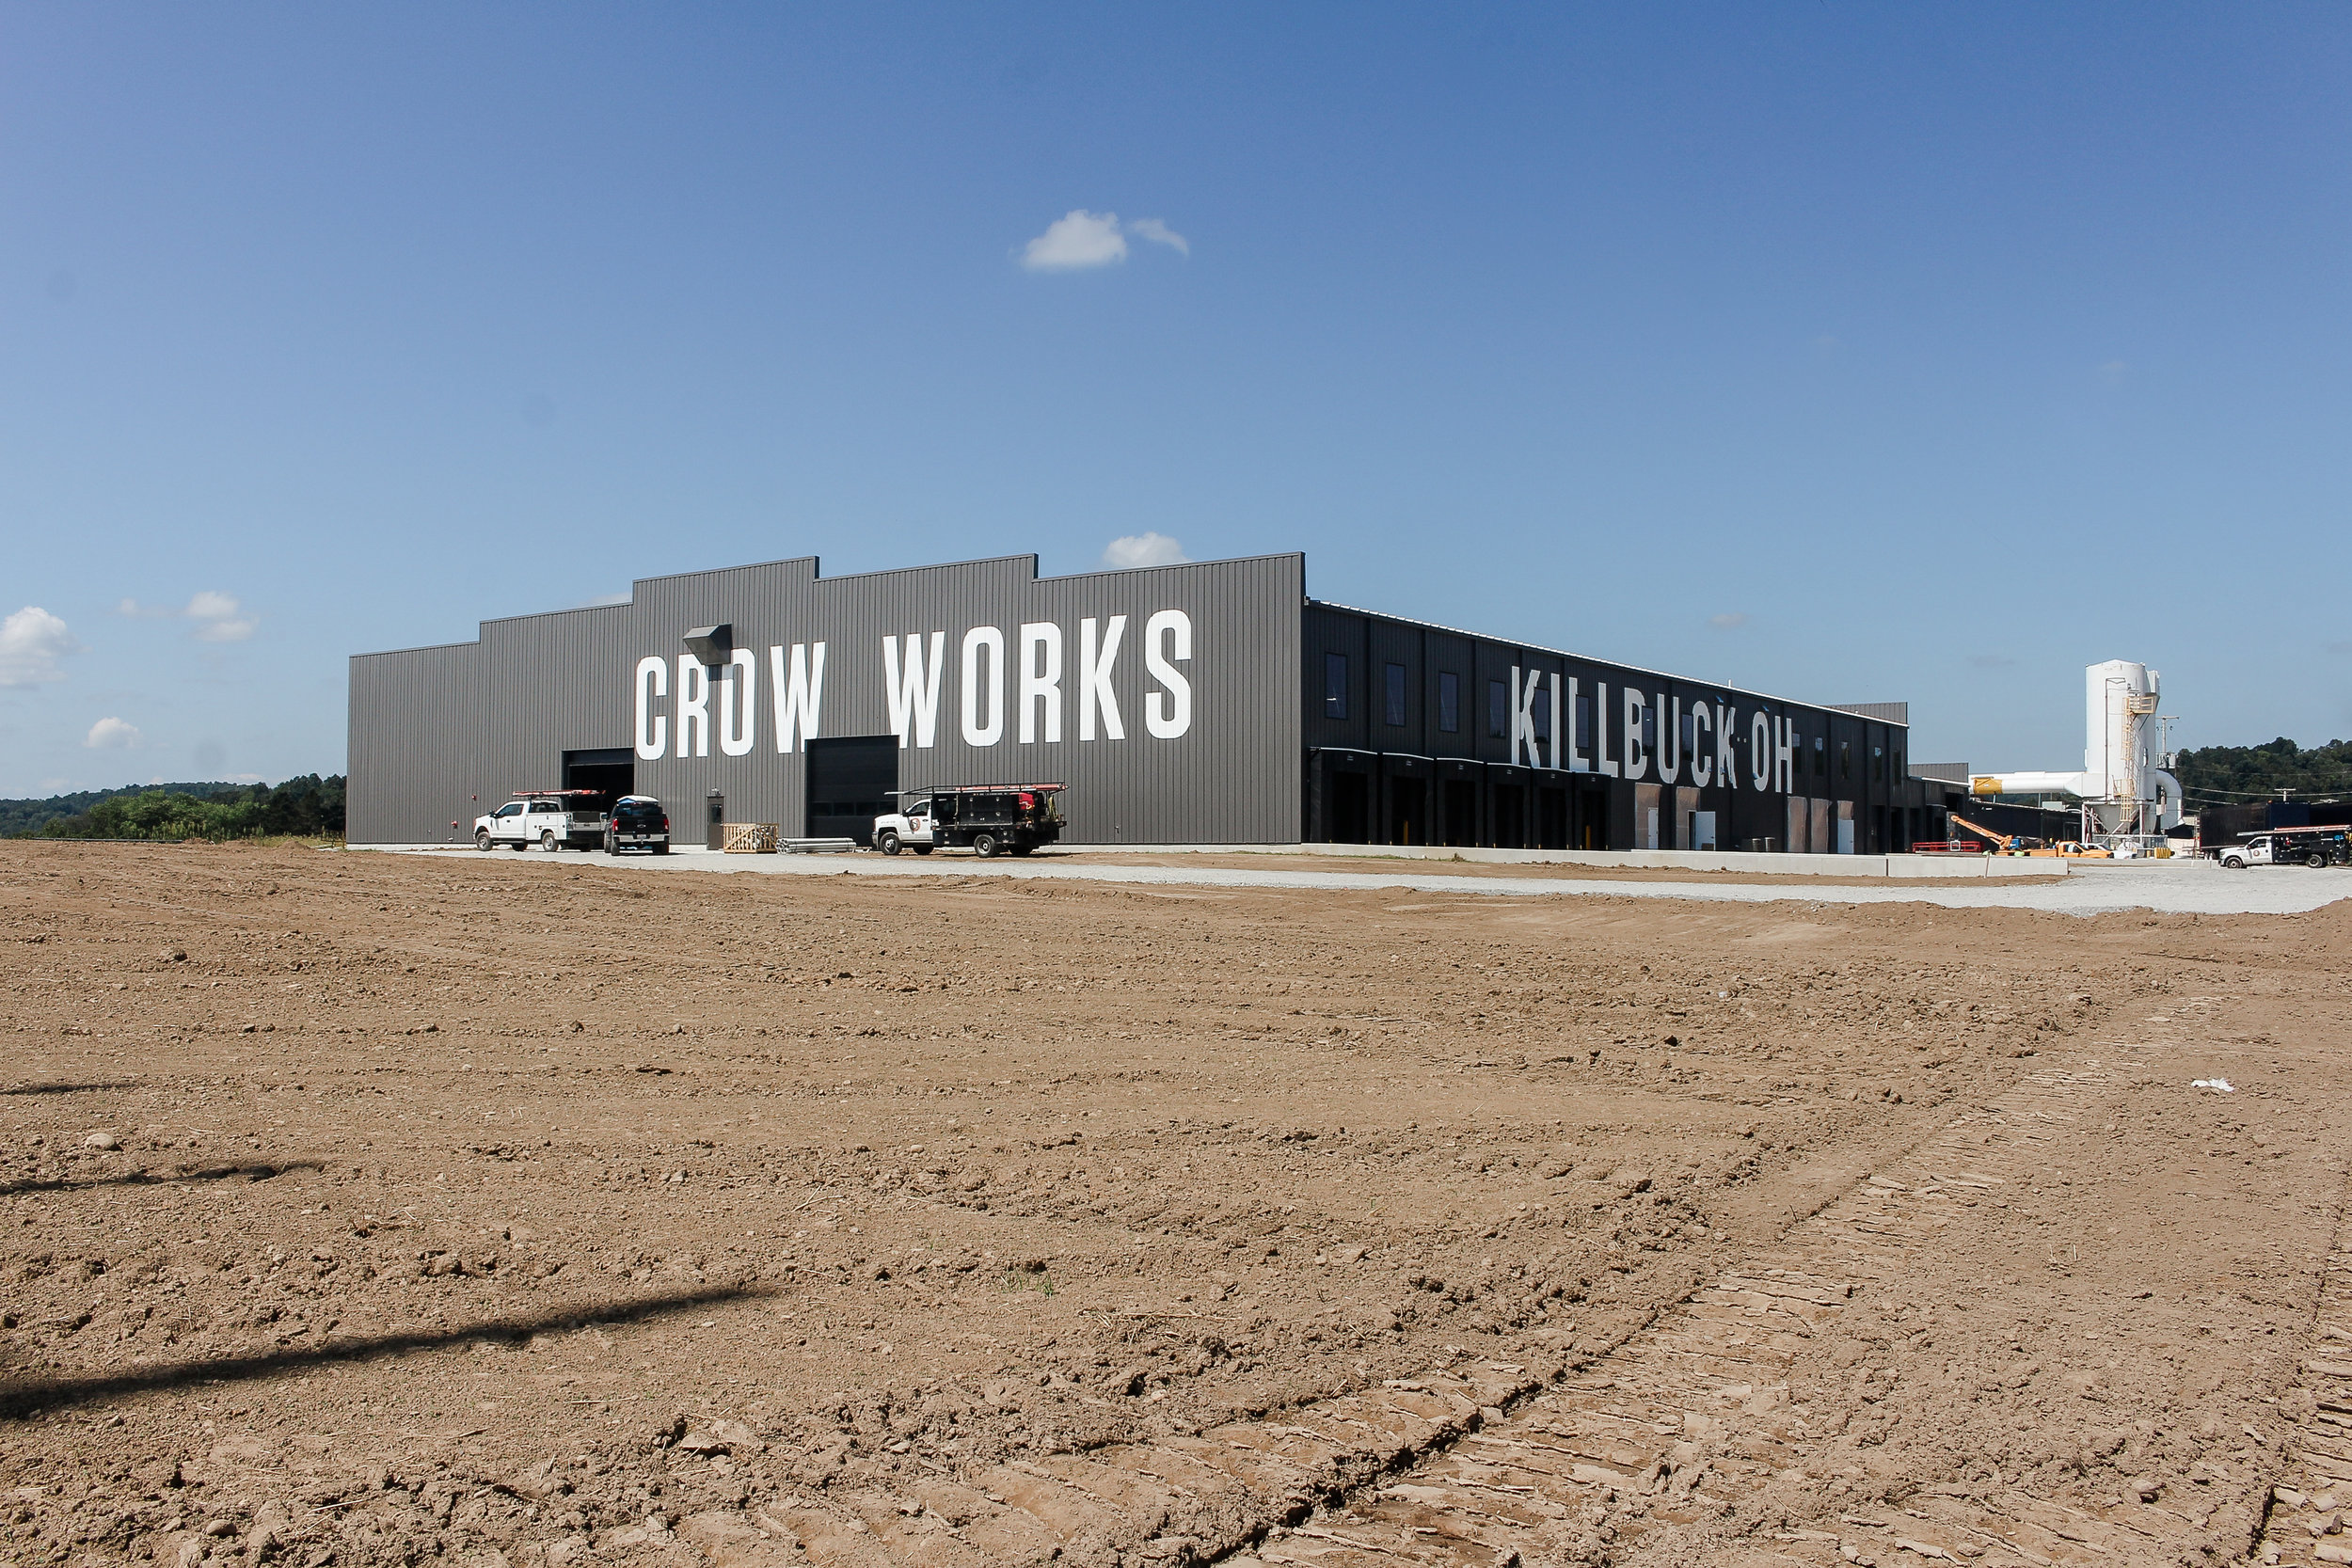 Crow Works Distribution Center